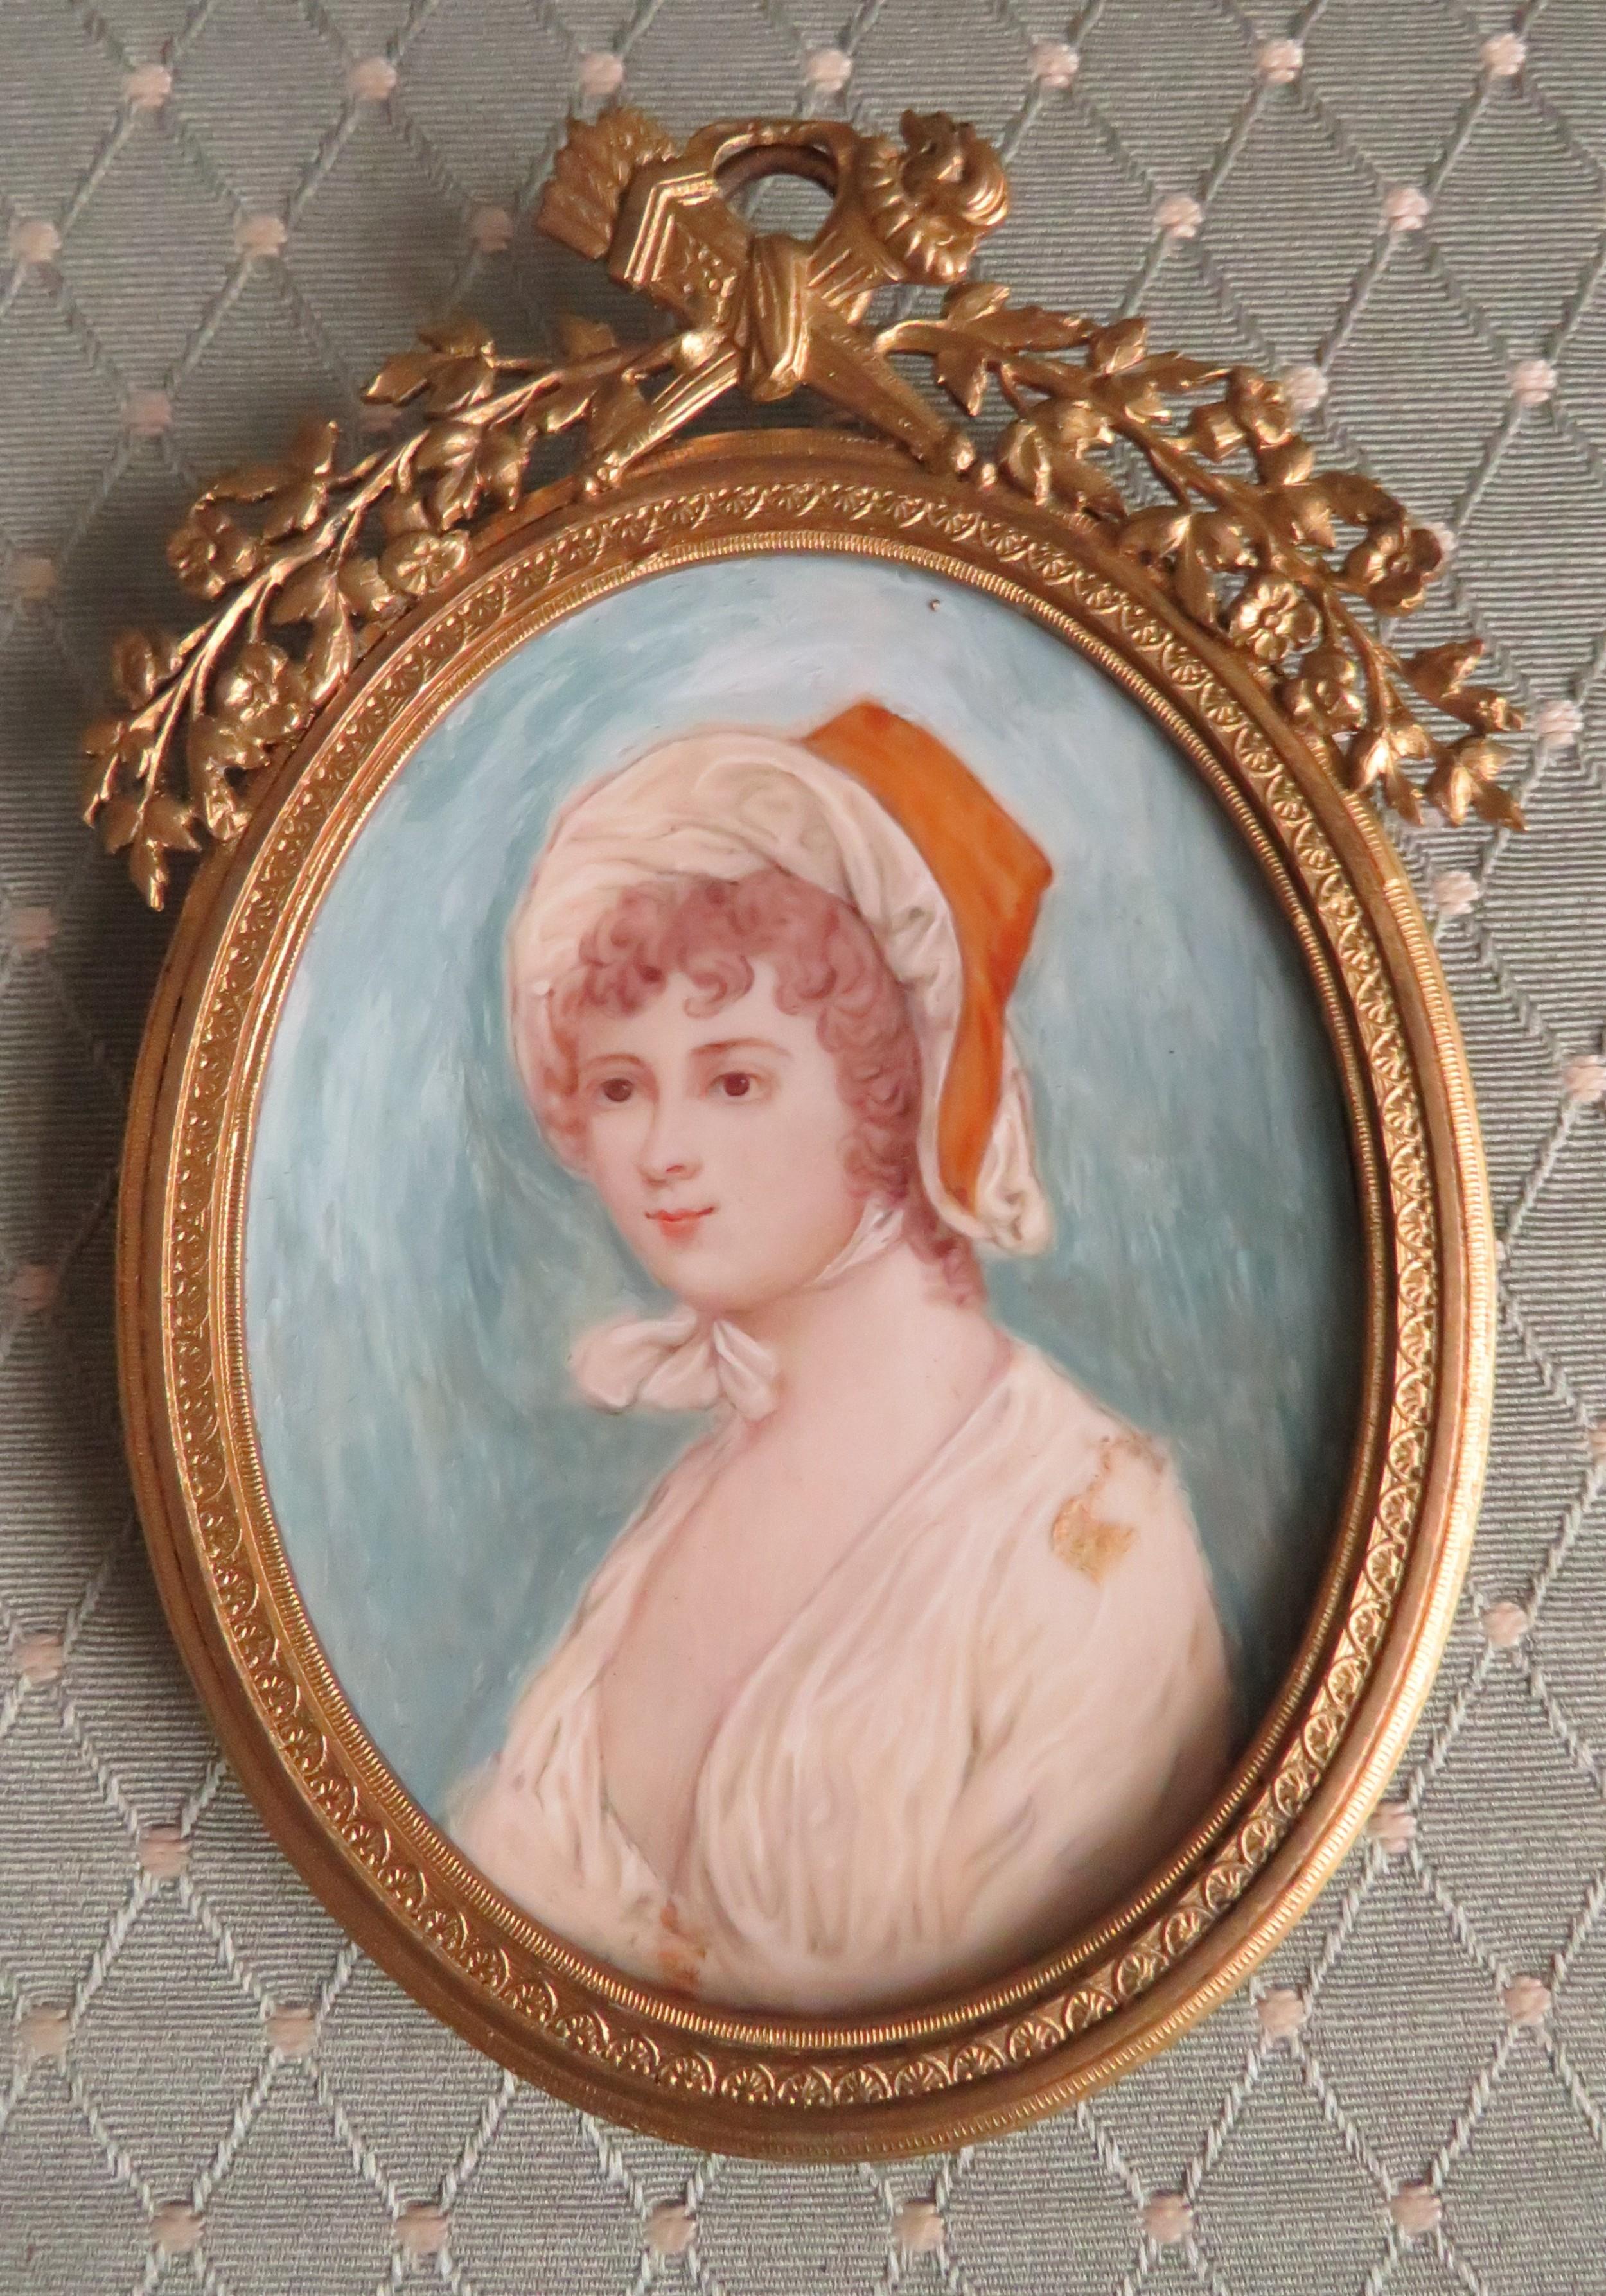 miniature portrait french school 1 of 3 gilt frame